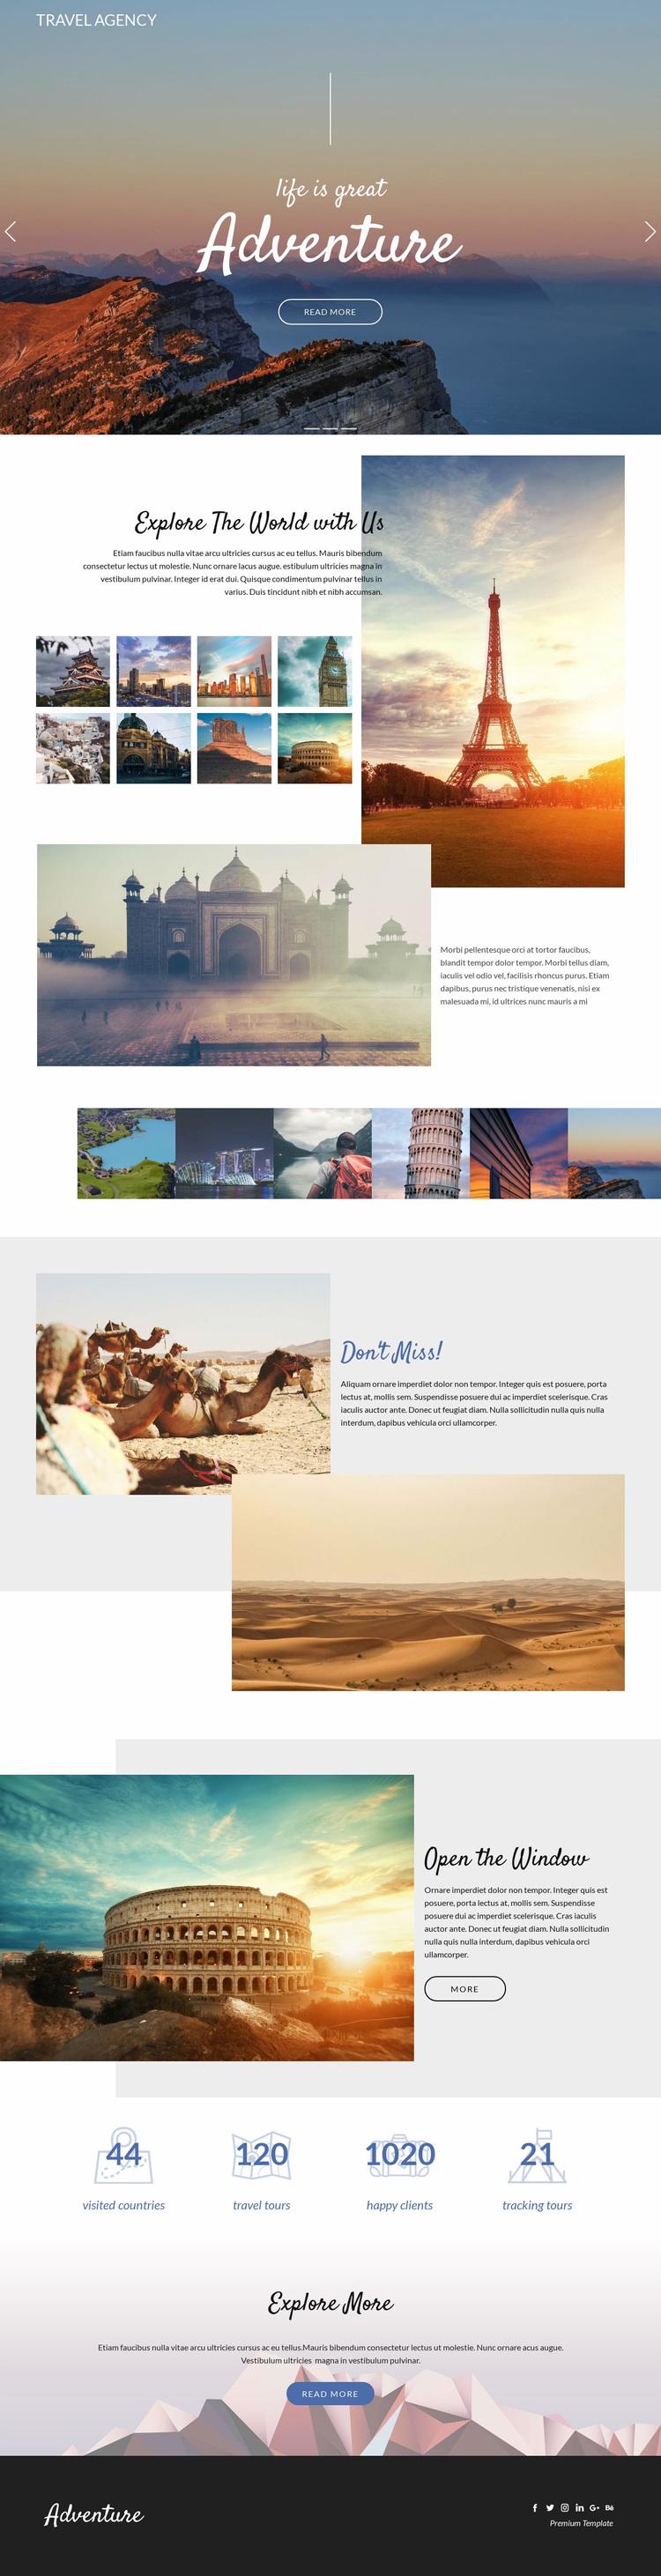 Adventure and travel Web Page Designer